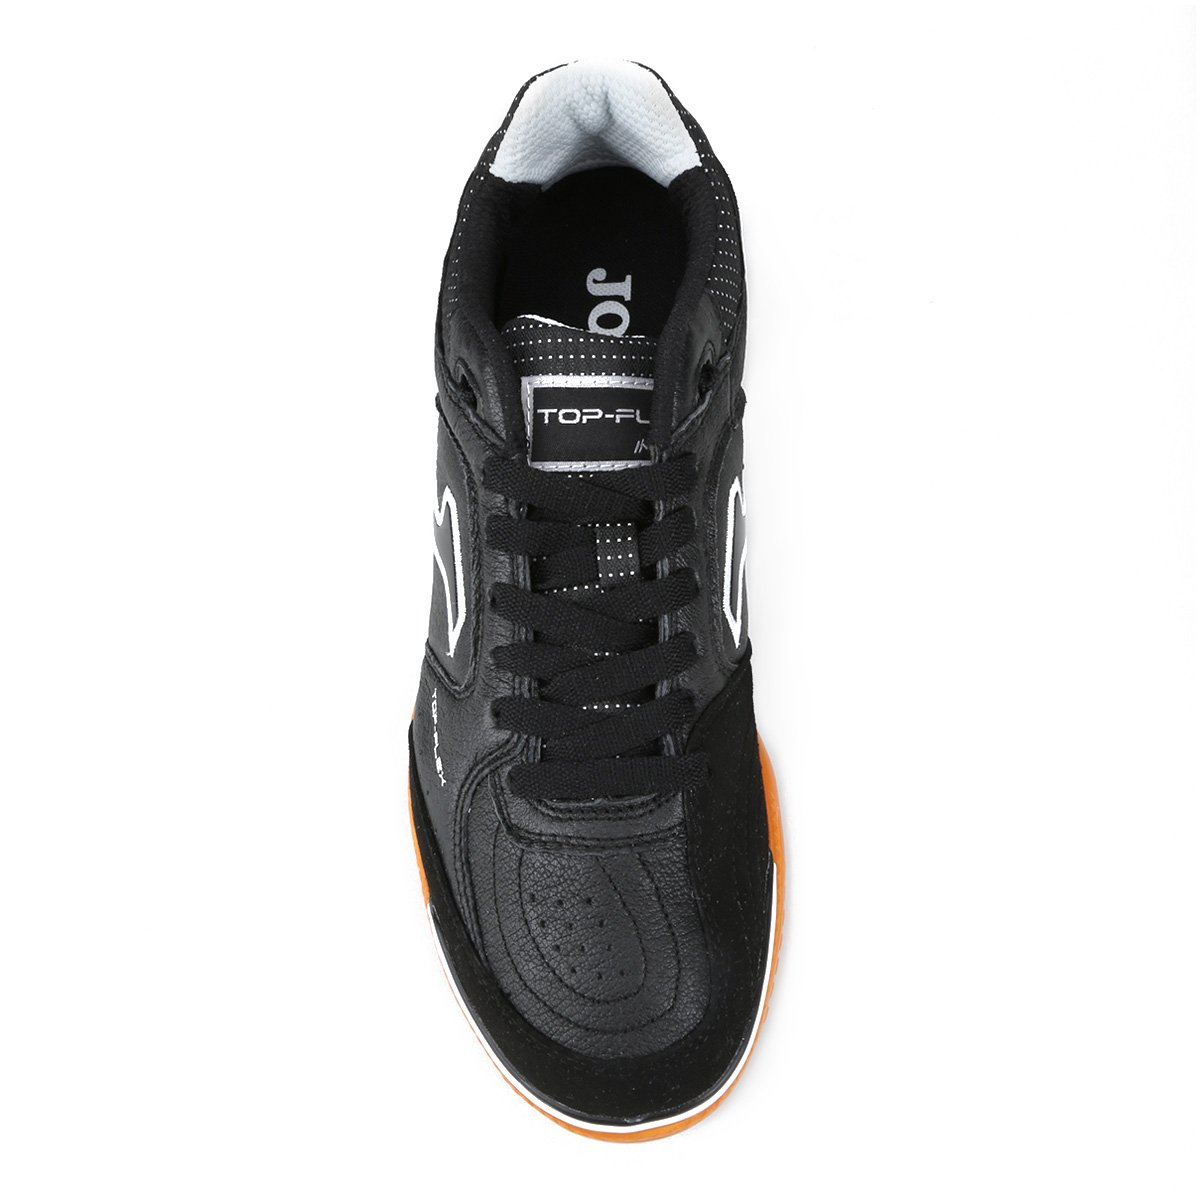 Chuteira Futsal Joma Top Flex - Compre Agora  c7c1ee3749609